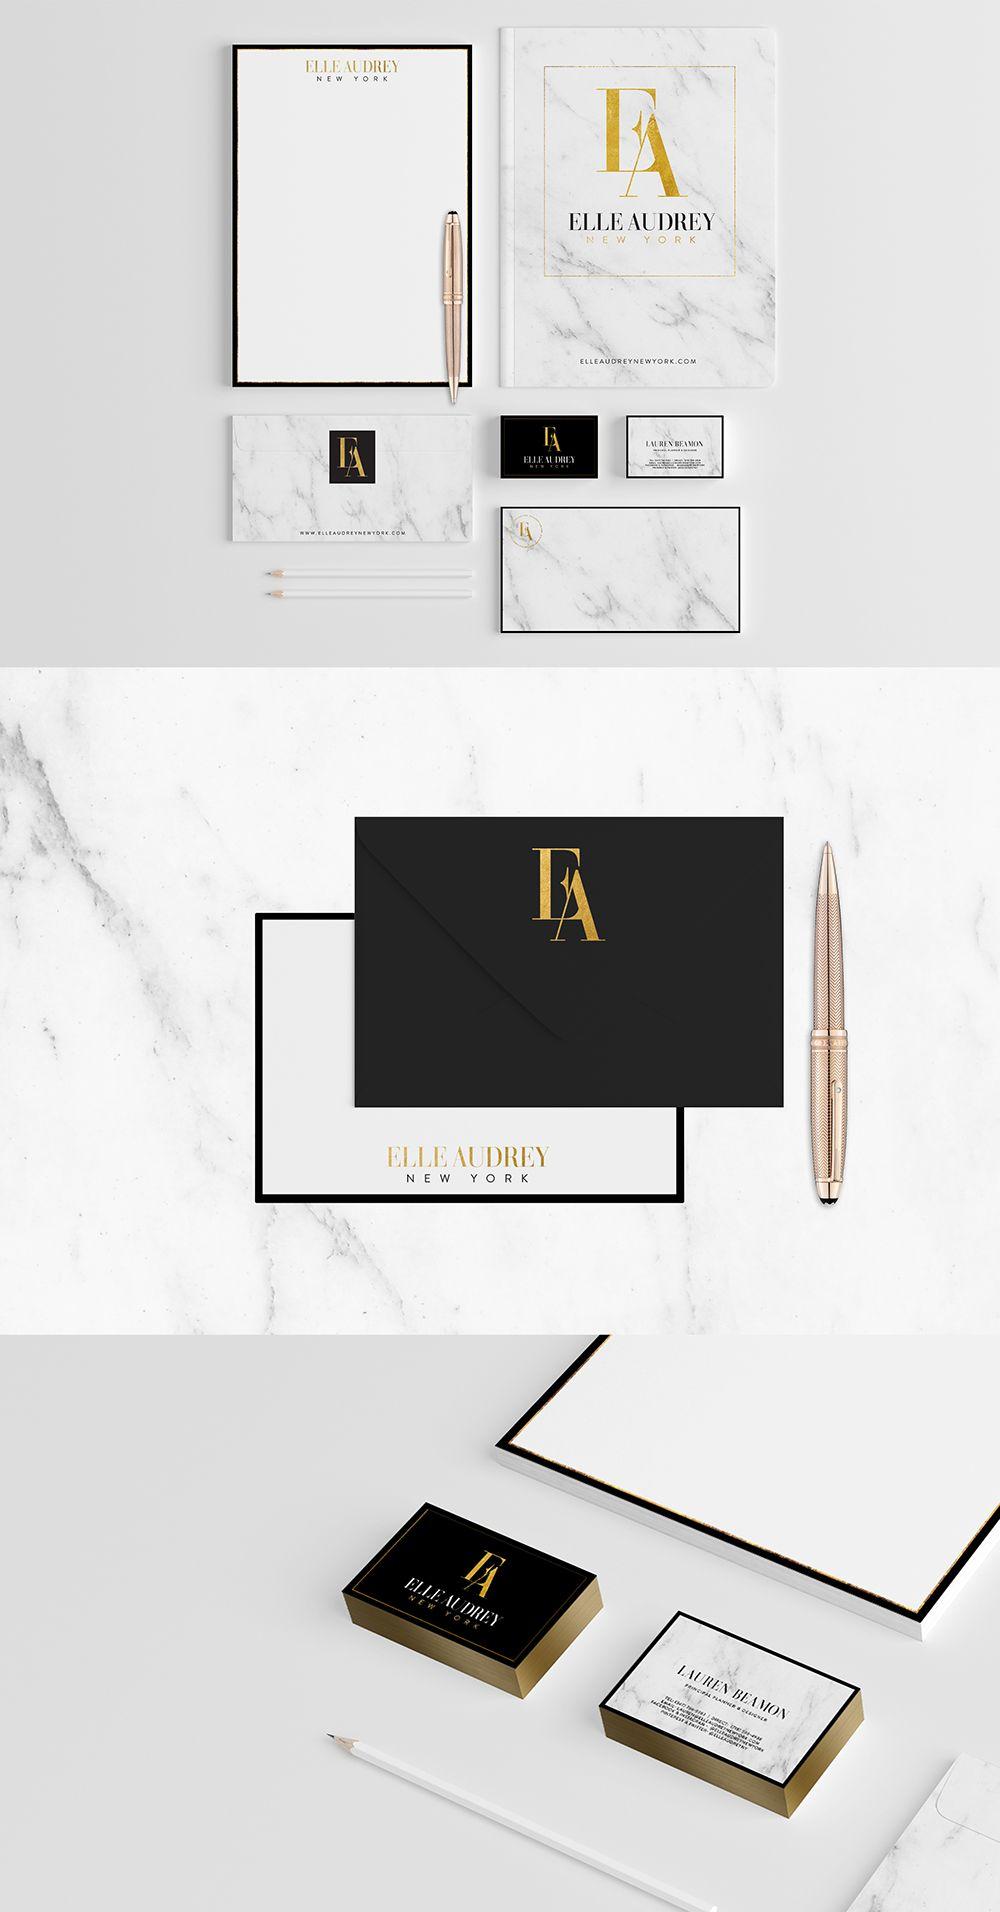 56c2c3d625034 Business branding, luxury brand design, gold foil and marble, brand  stationery design for Elle Audrey New York